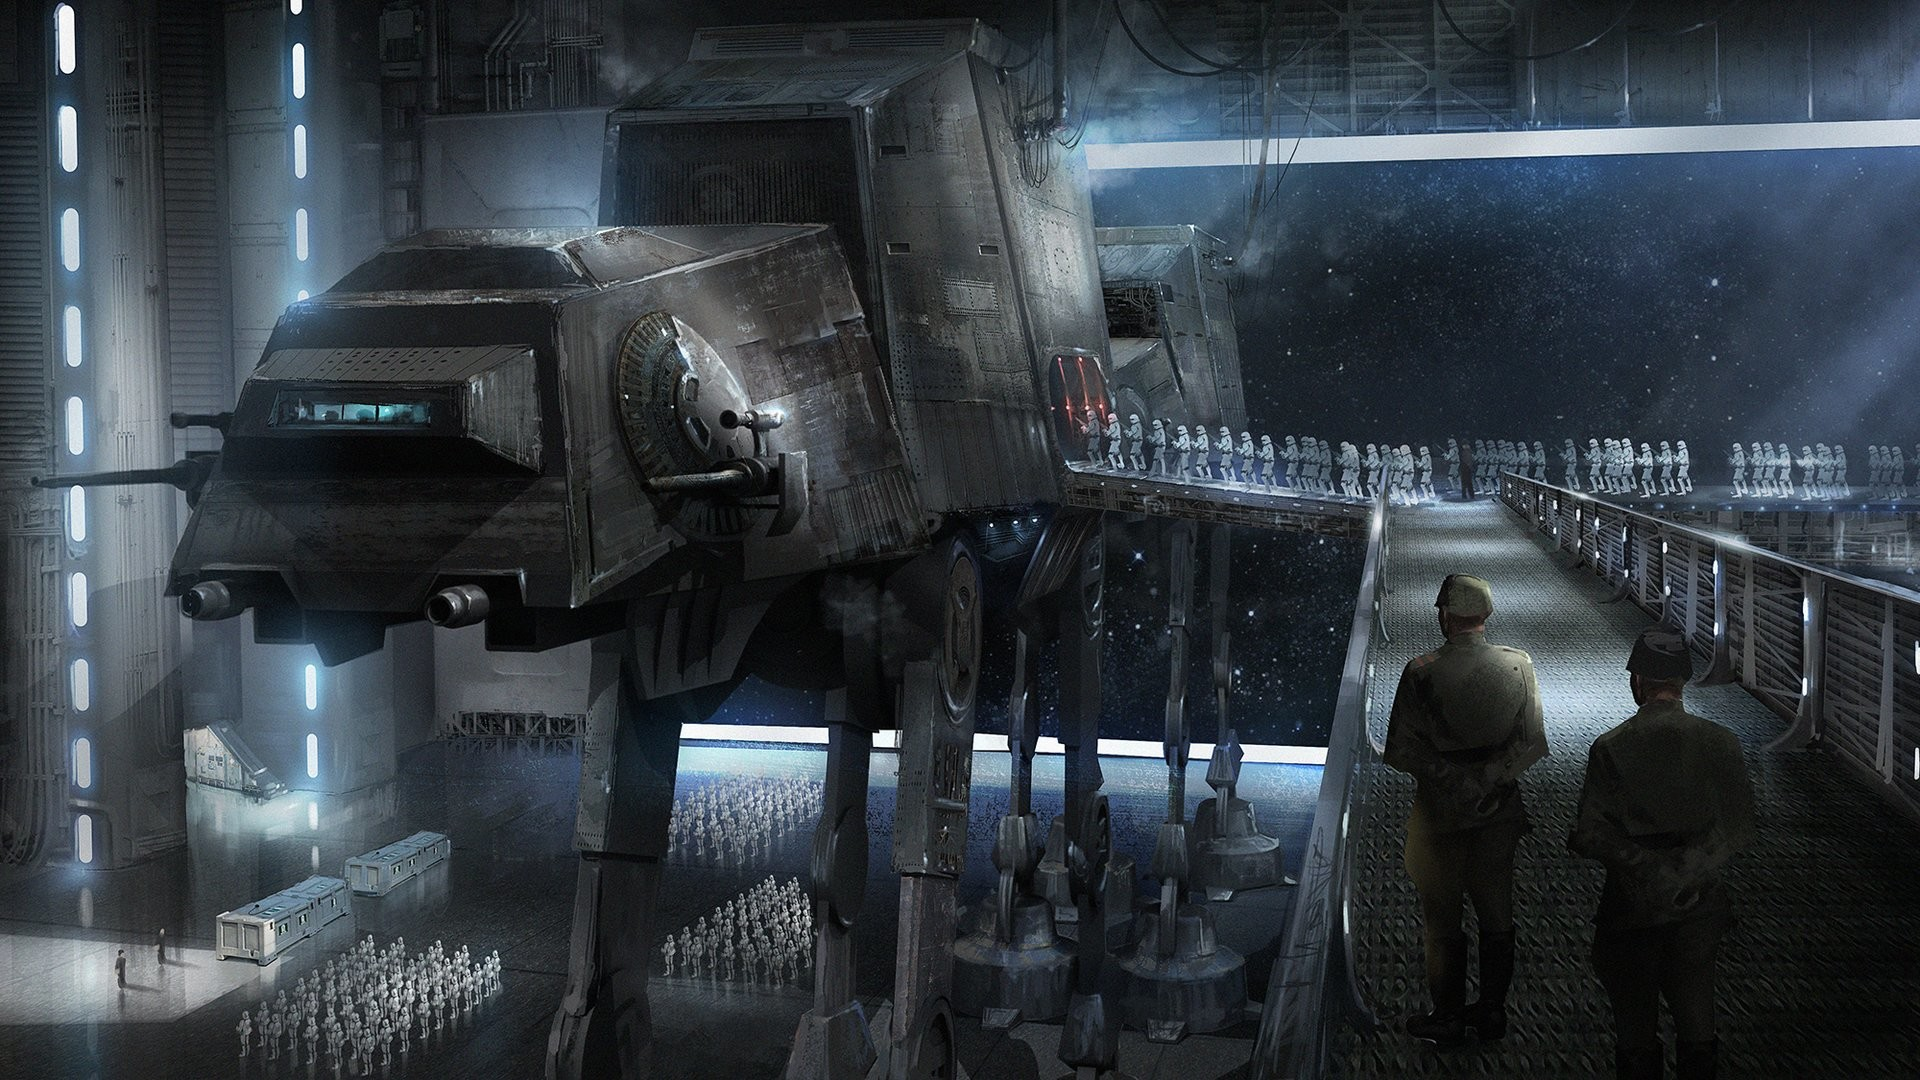 Deployment – Star Wars fan art by Tysen Johnson View Original Source Here